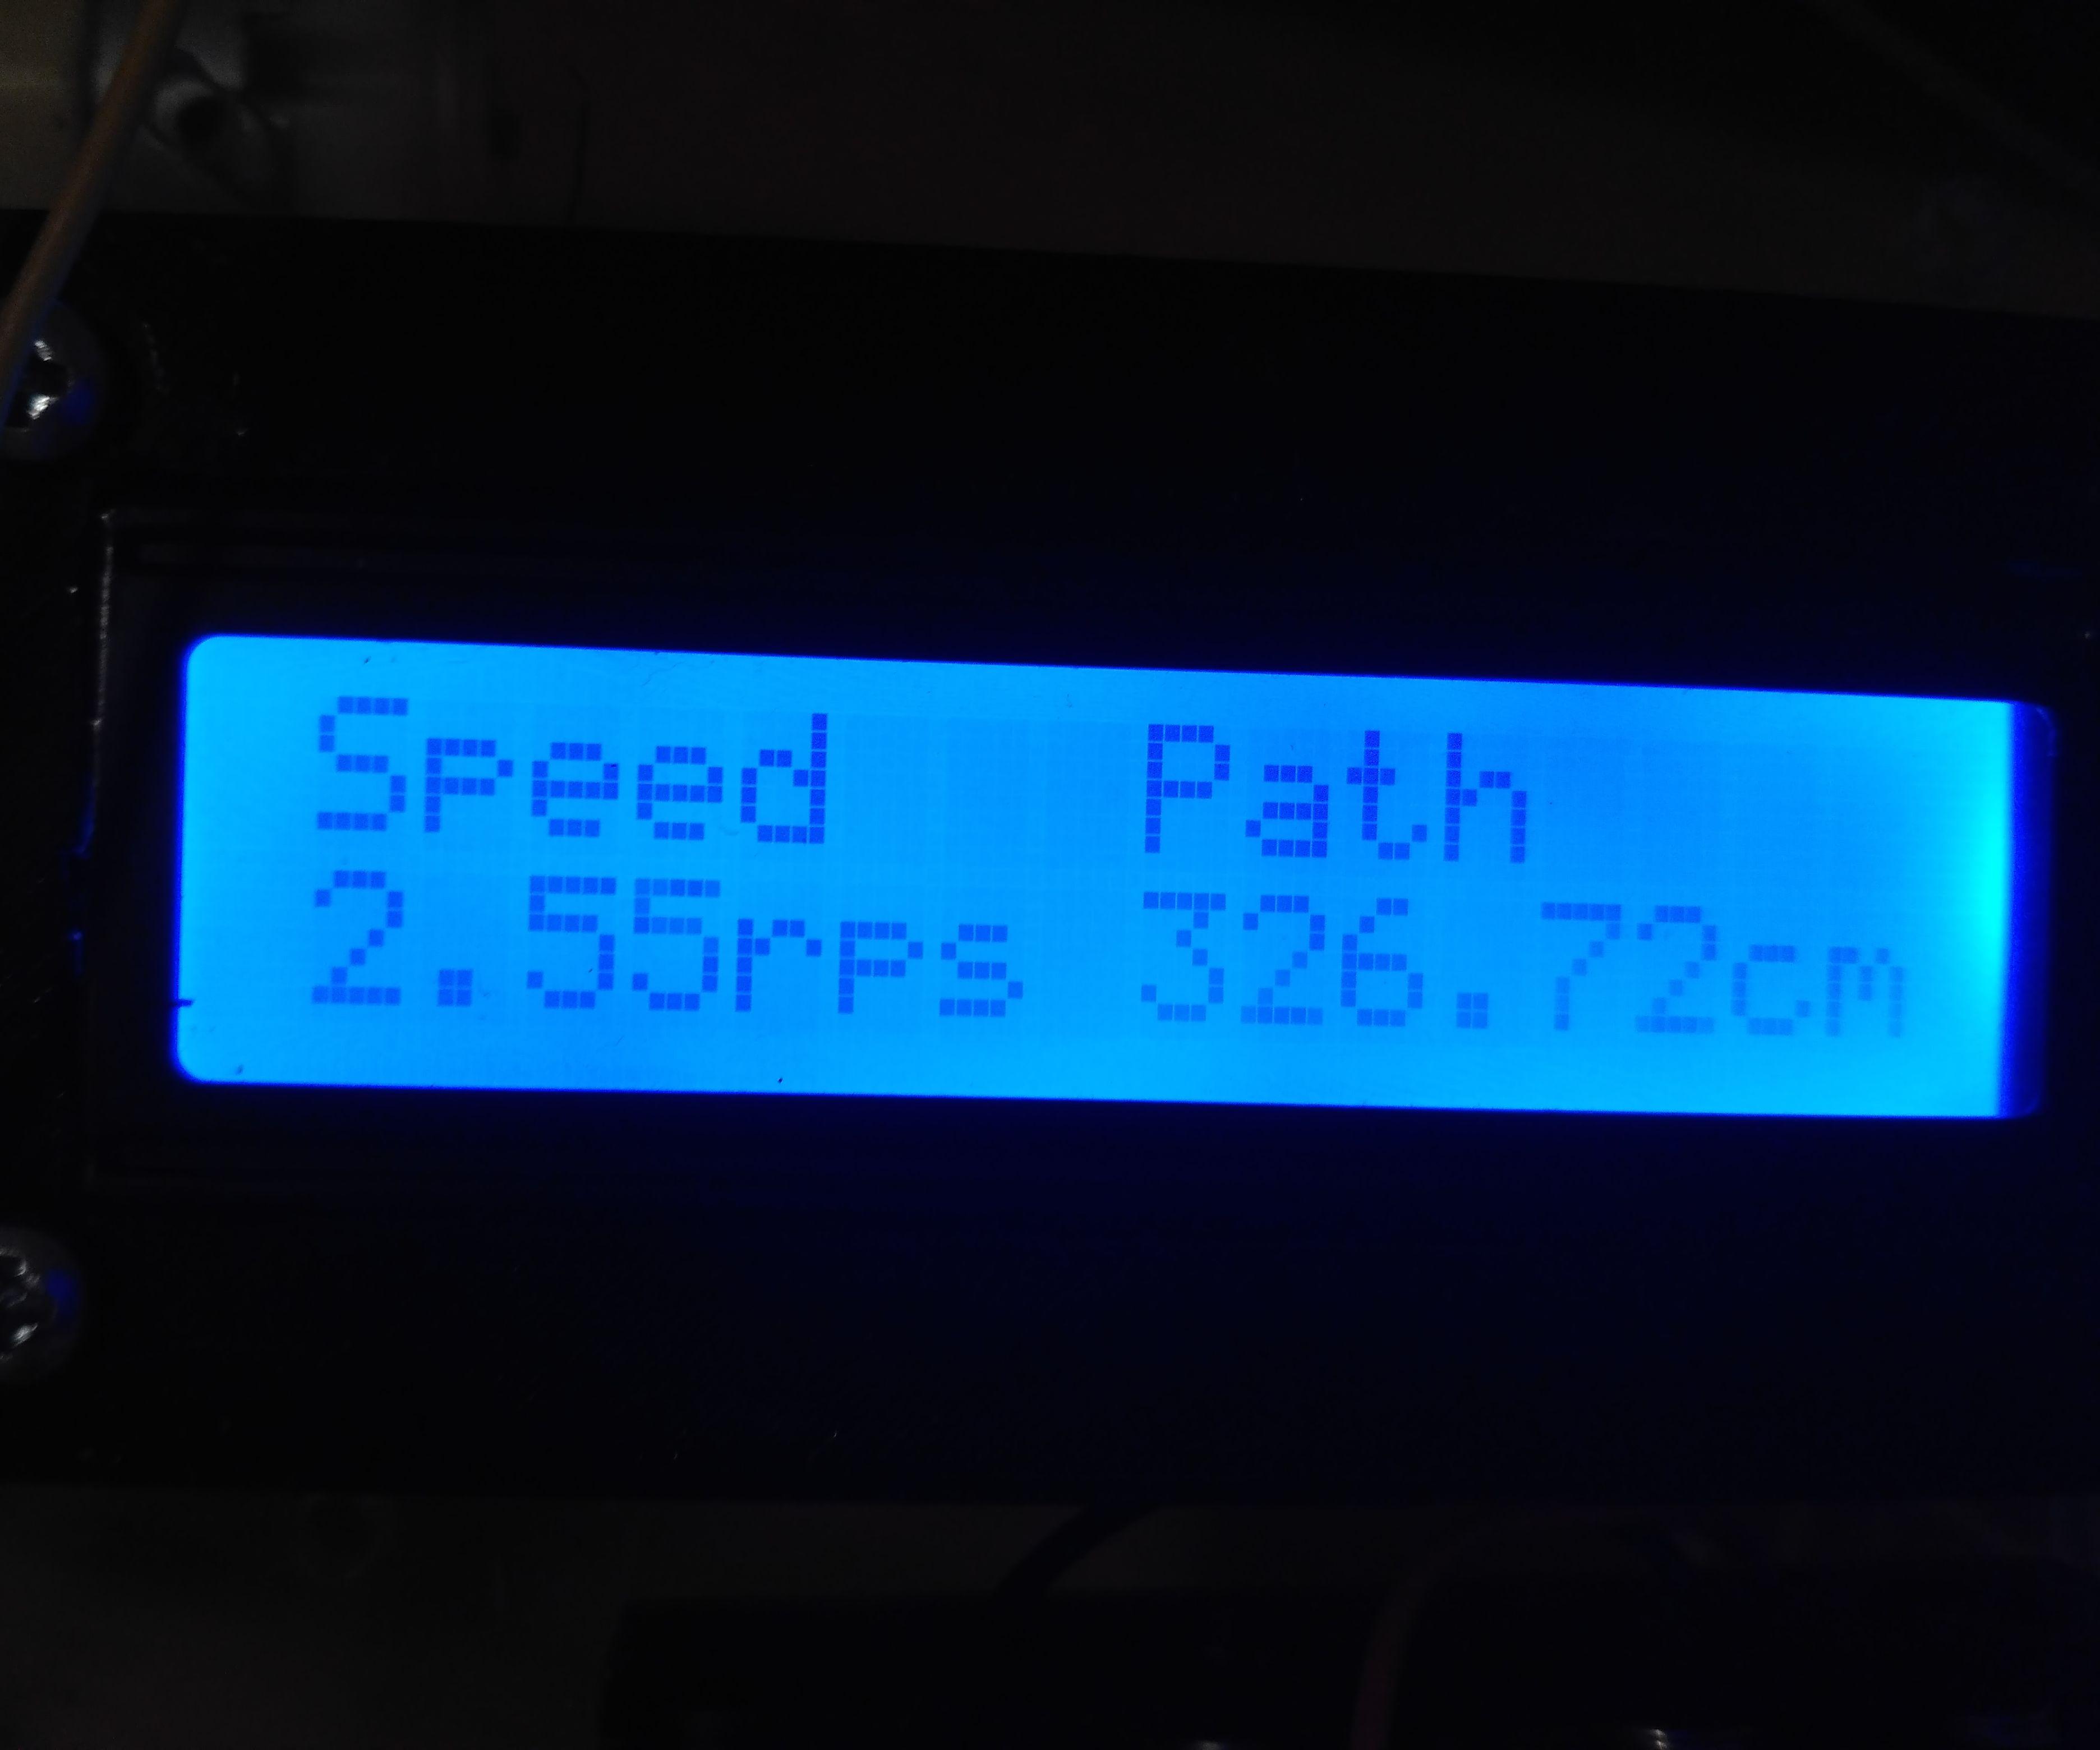 RPM measurement using Hall sensor and Arduino